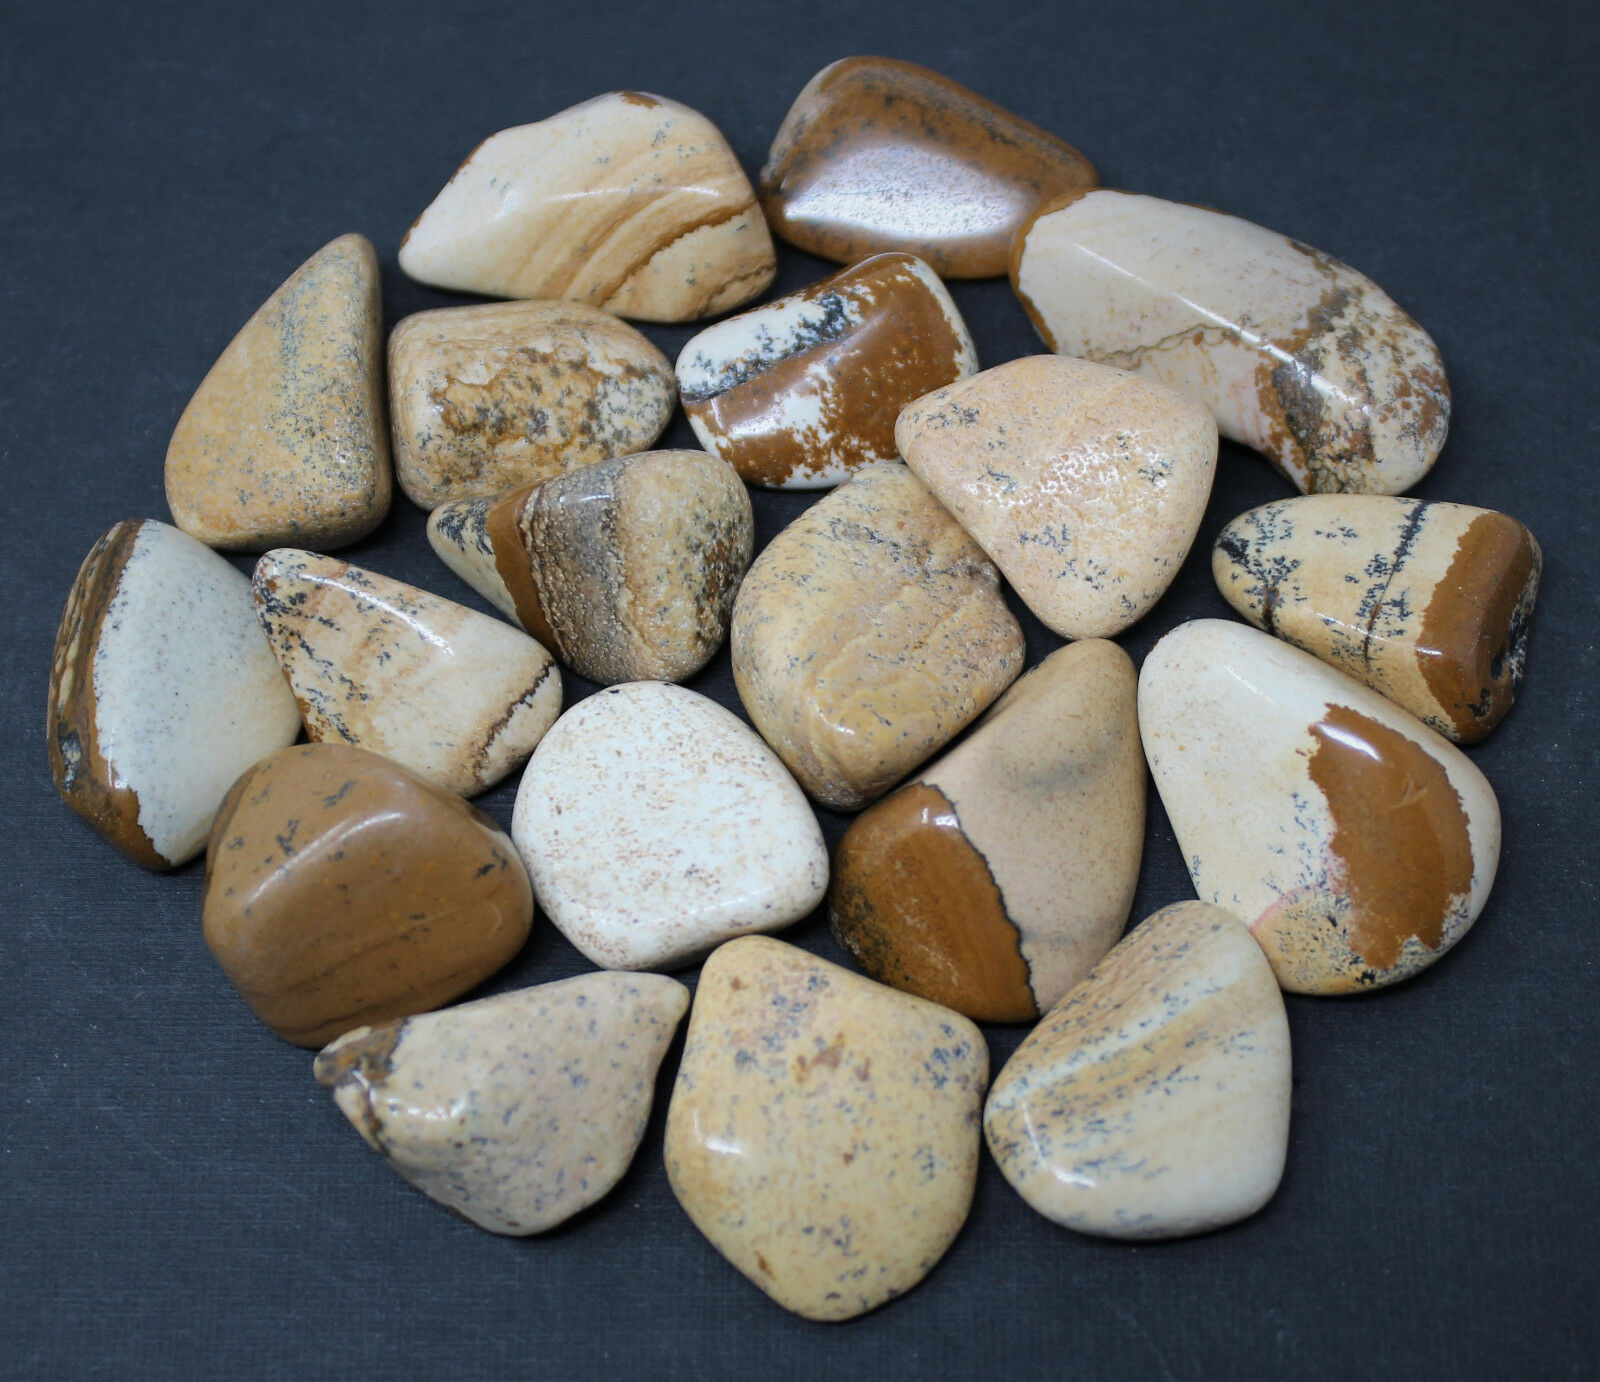 1/4 lb Lots Wholesale Bulk Tumbled Stones: Choose Type (Crystal Healing, 4 oz) B